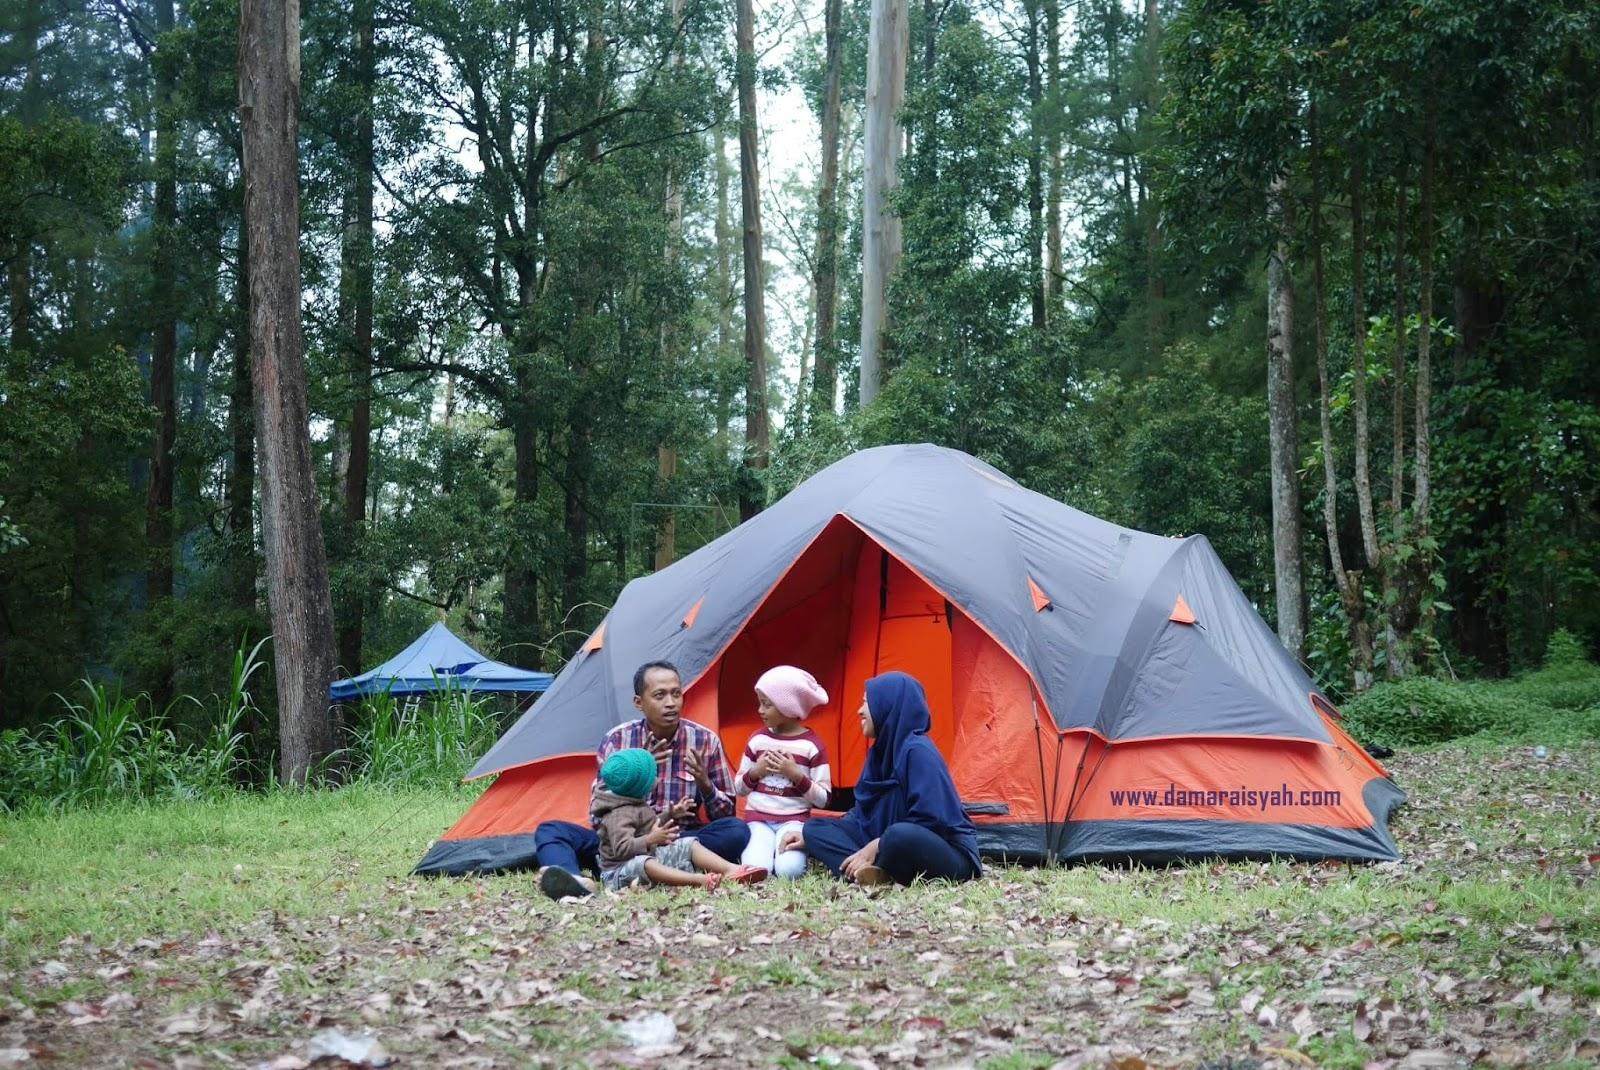 Mojosemi Forest Park Wisata Alam Di Ujung Barat Kota